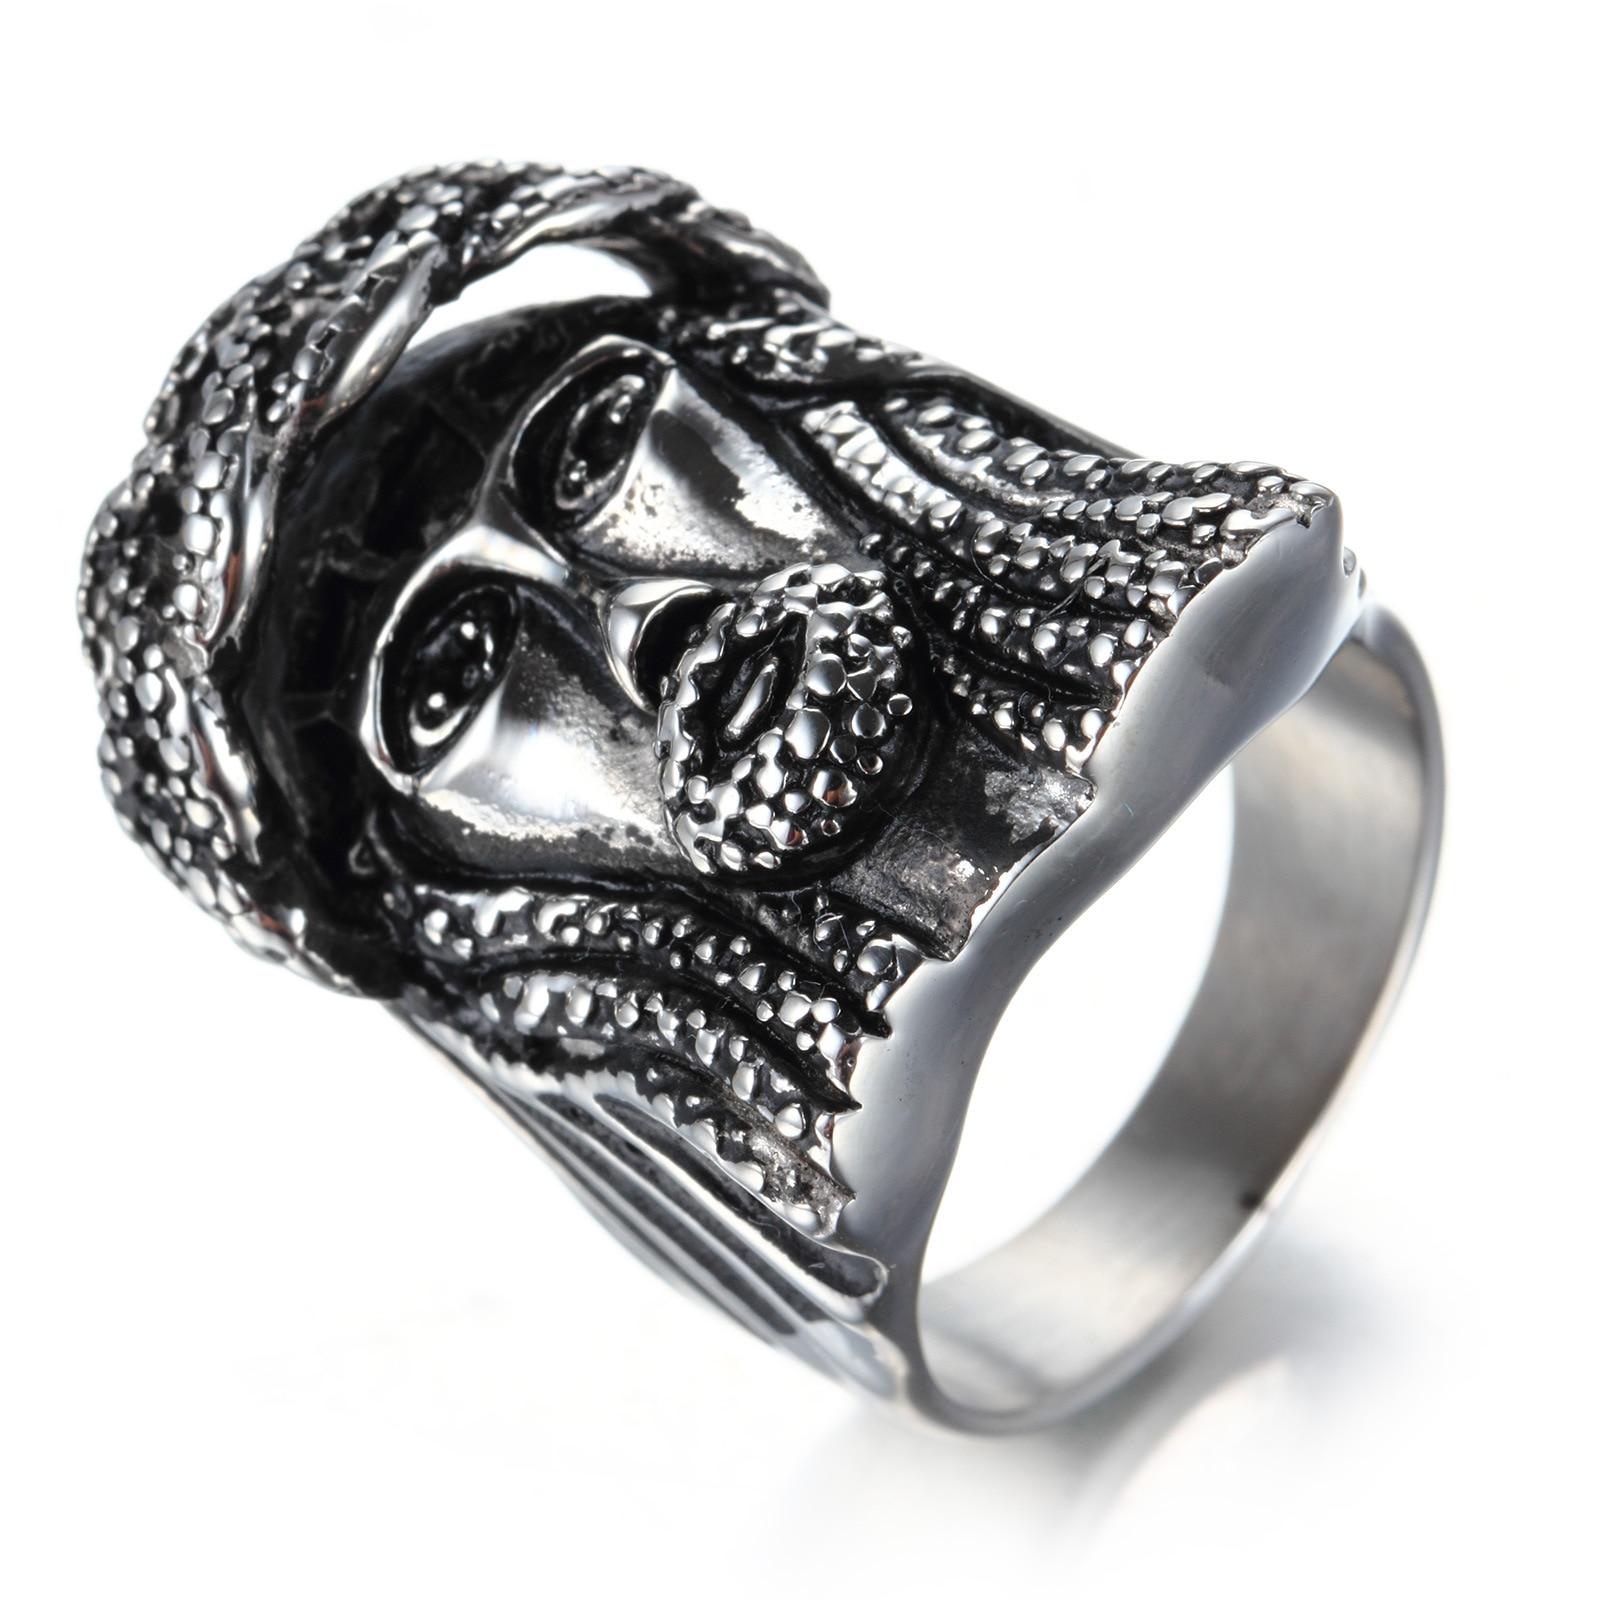 Hip hop schmuck  Online Kaufen Großhandel jesus kopf ring aus China jesus kopf ring ...